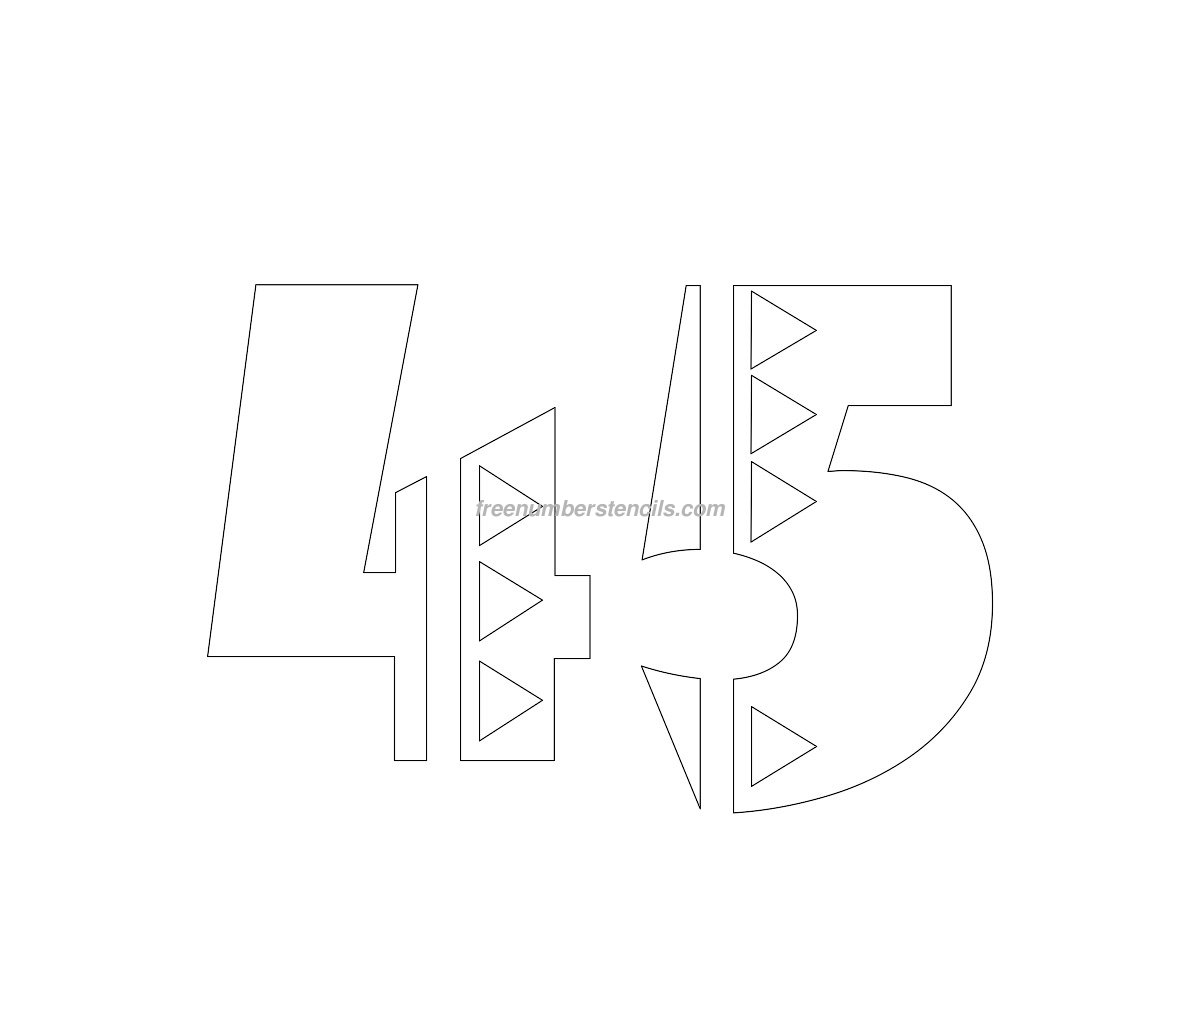 Free Mexican 45 Number Stencil - Freenumberstencils.com